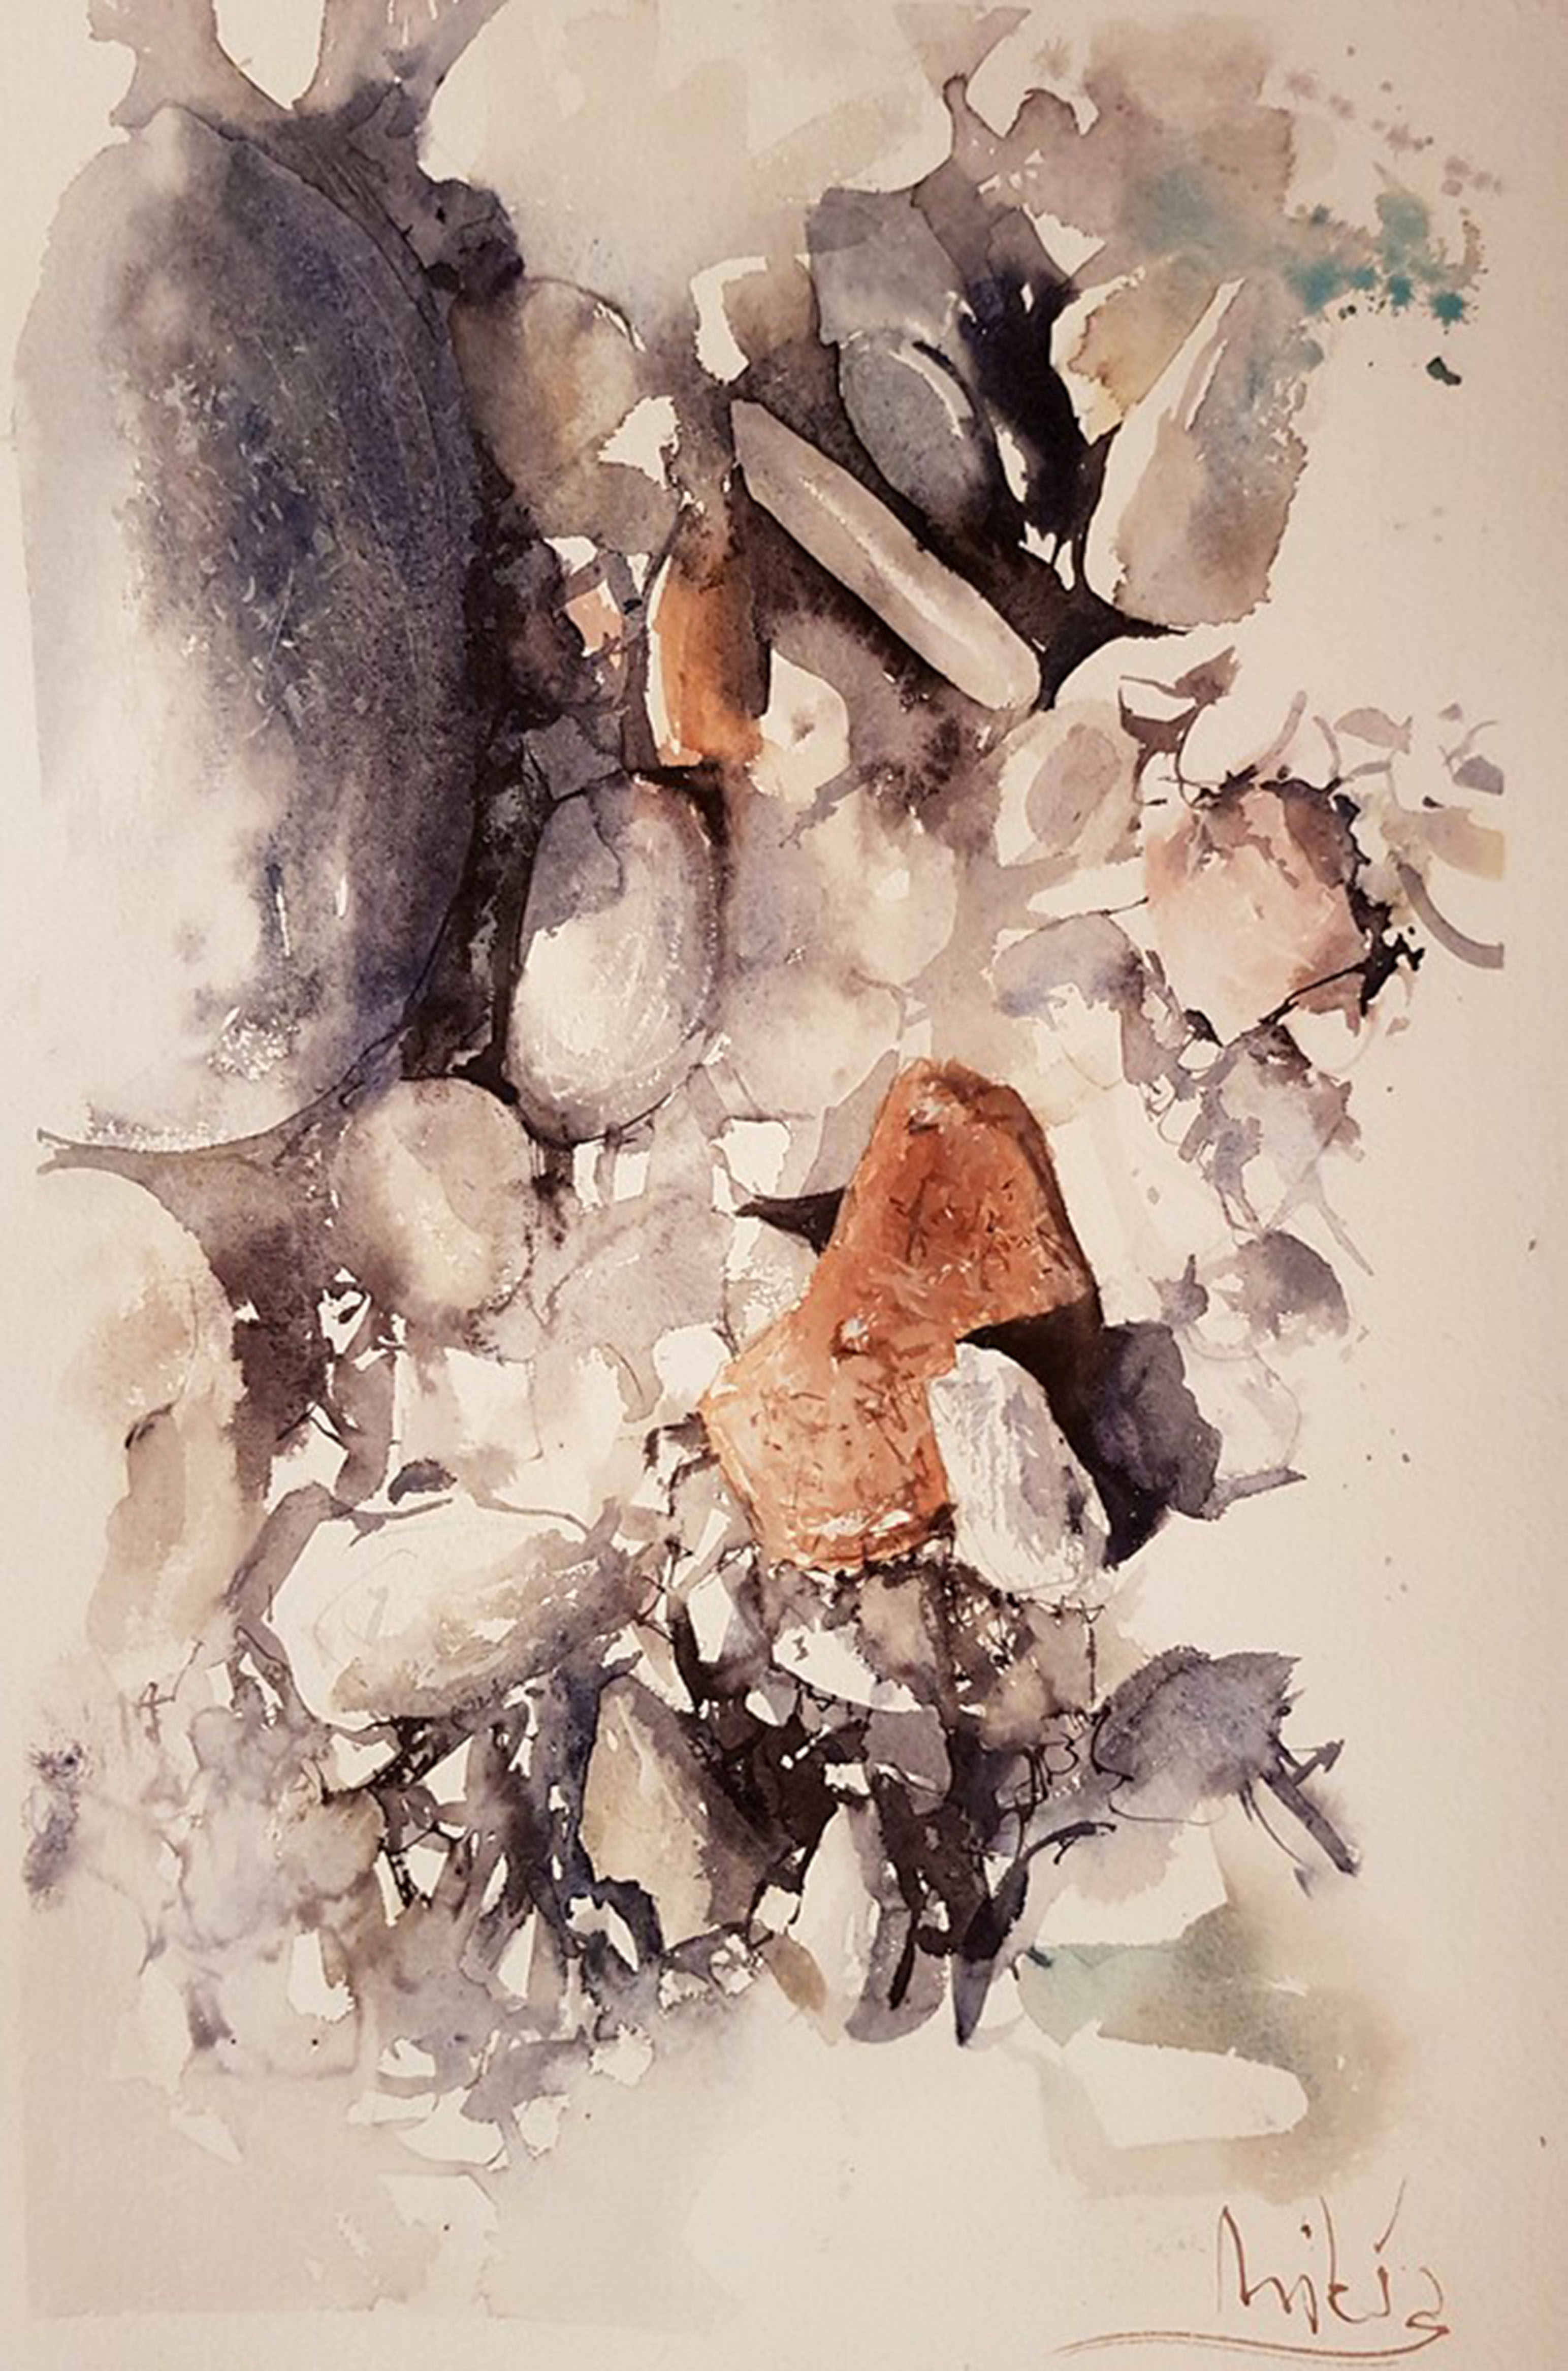 #WorldWatercolorGroup - watercolor by Dalibor Popovic Miksa of rocks - #doodlewash